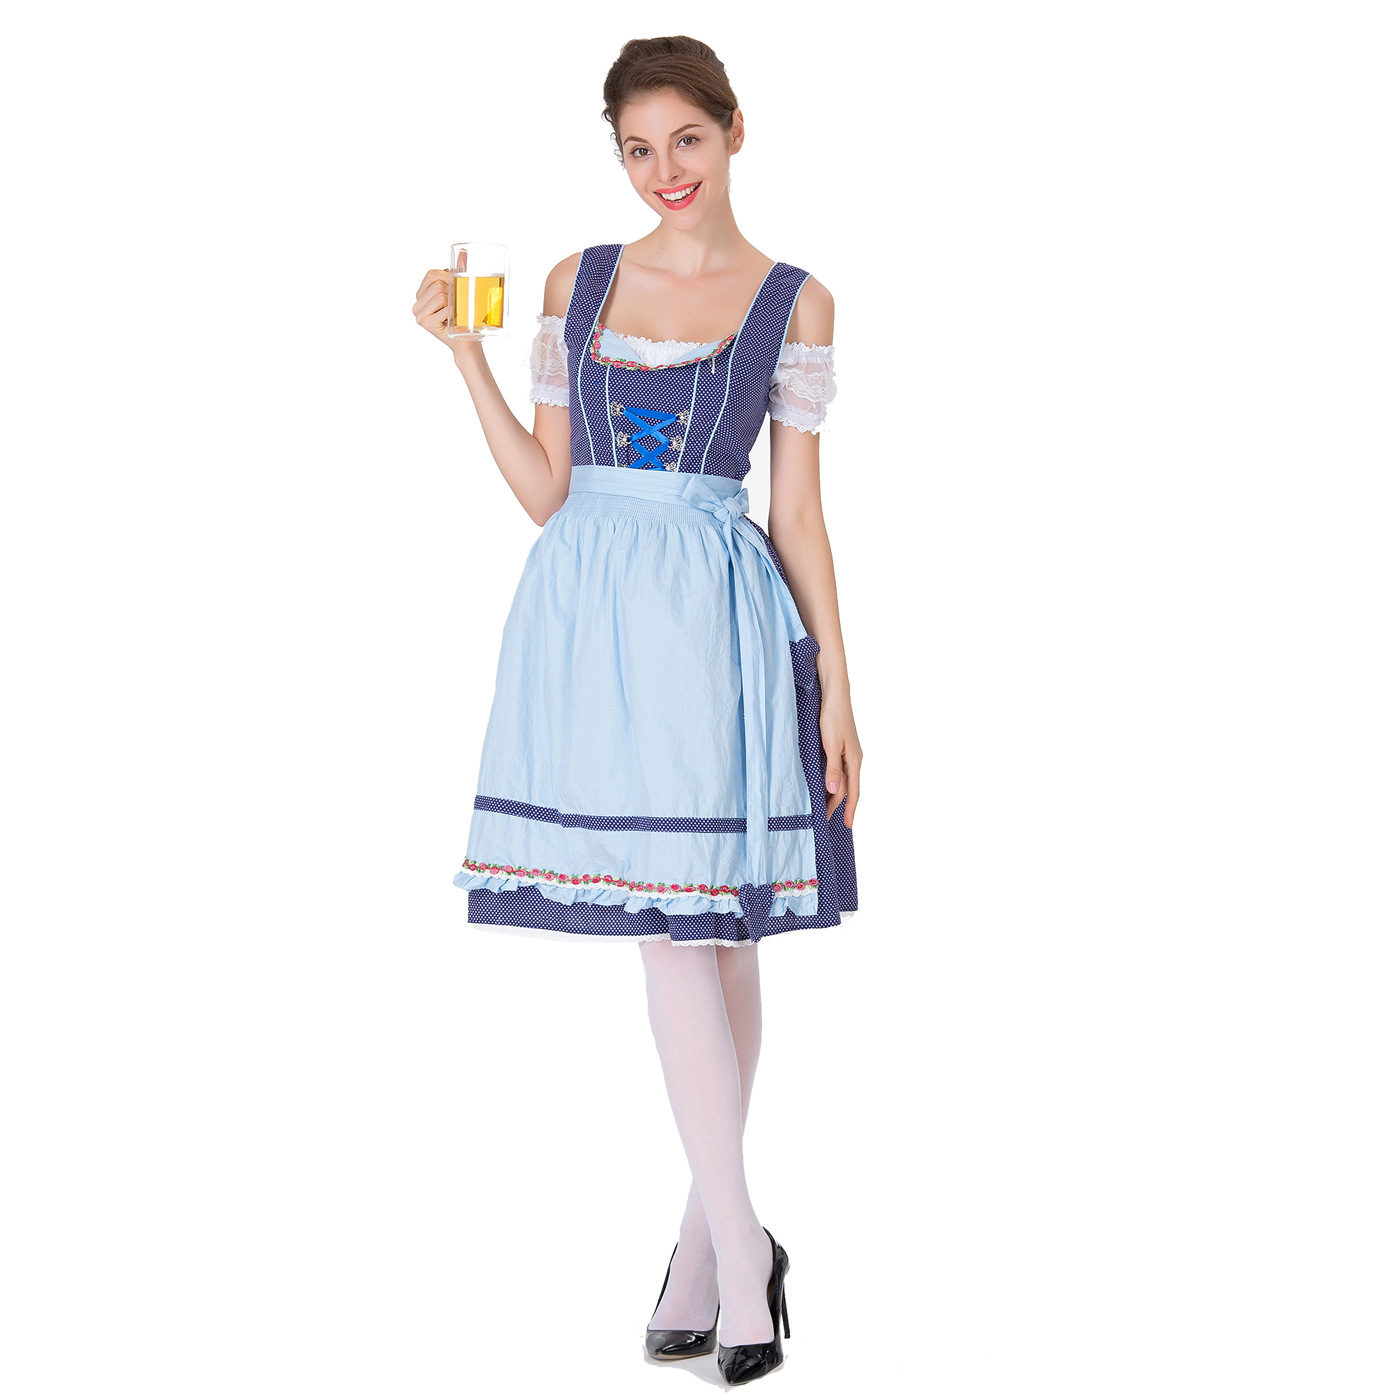 Women Large Size Oktoberfest Style Dirndl Dress Bavarian Style Waitress Halloween Costume blue_S